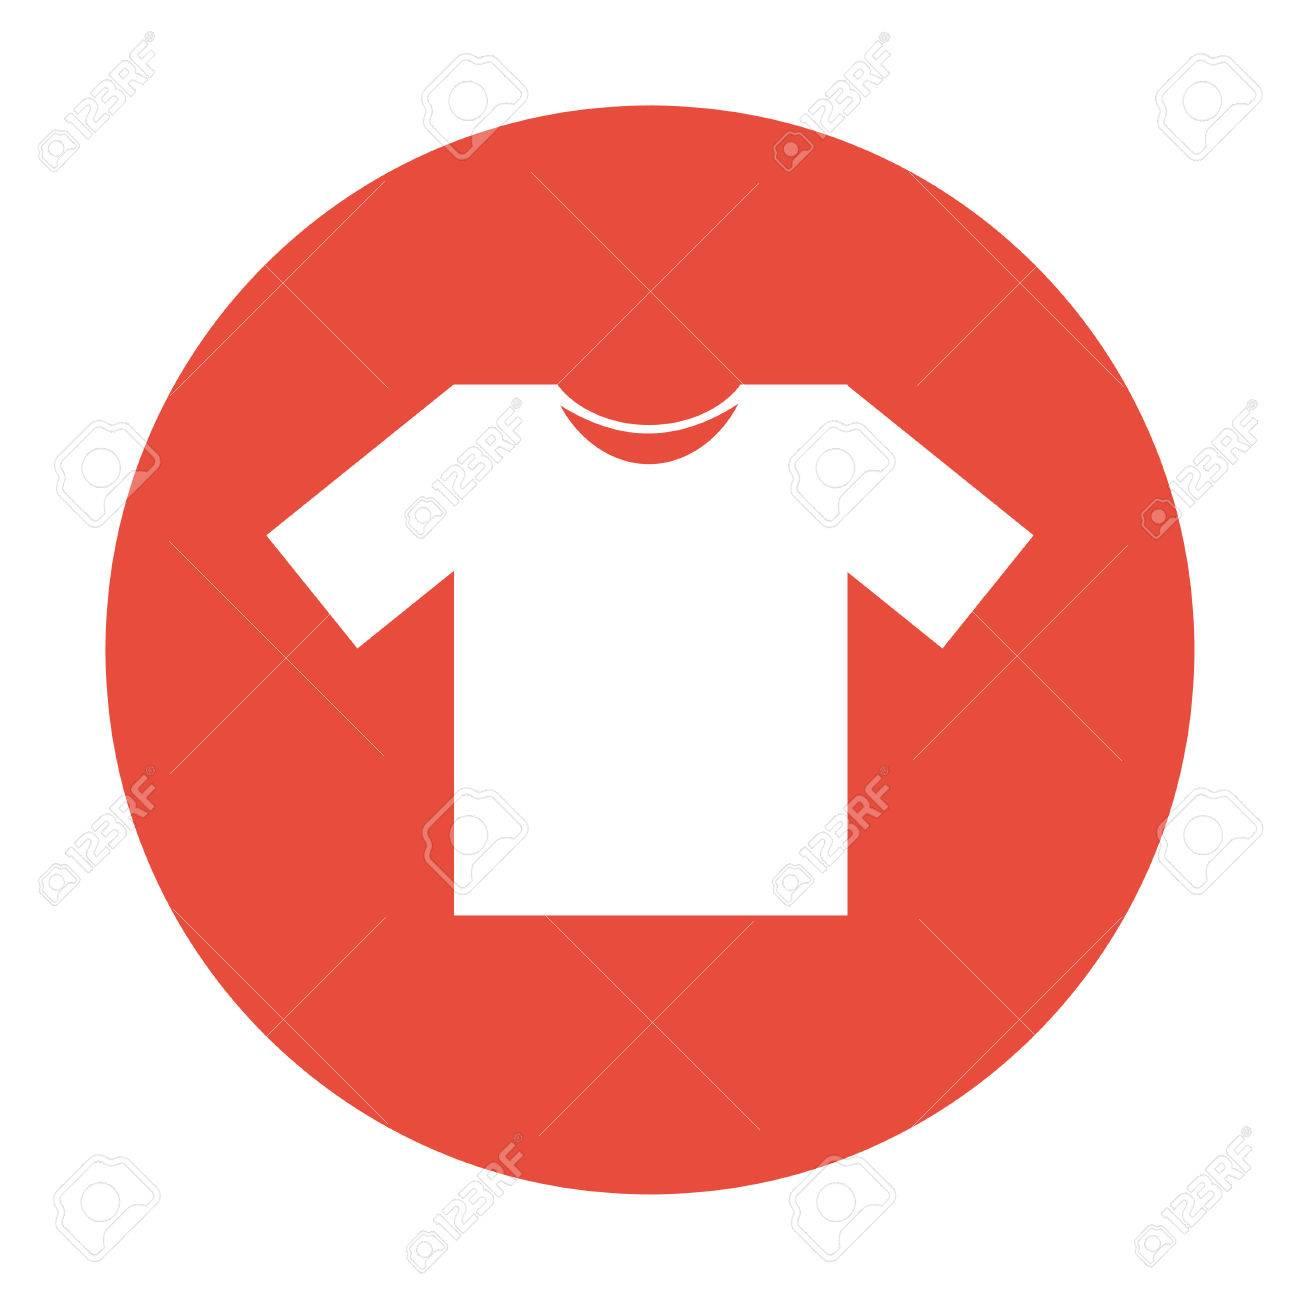 tshirt icon icon illustration flat design style royalty free cliparts vectors and stock illustration image 48894874 123rf com